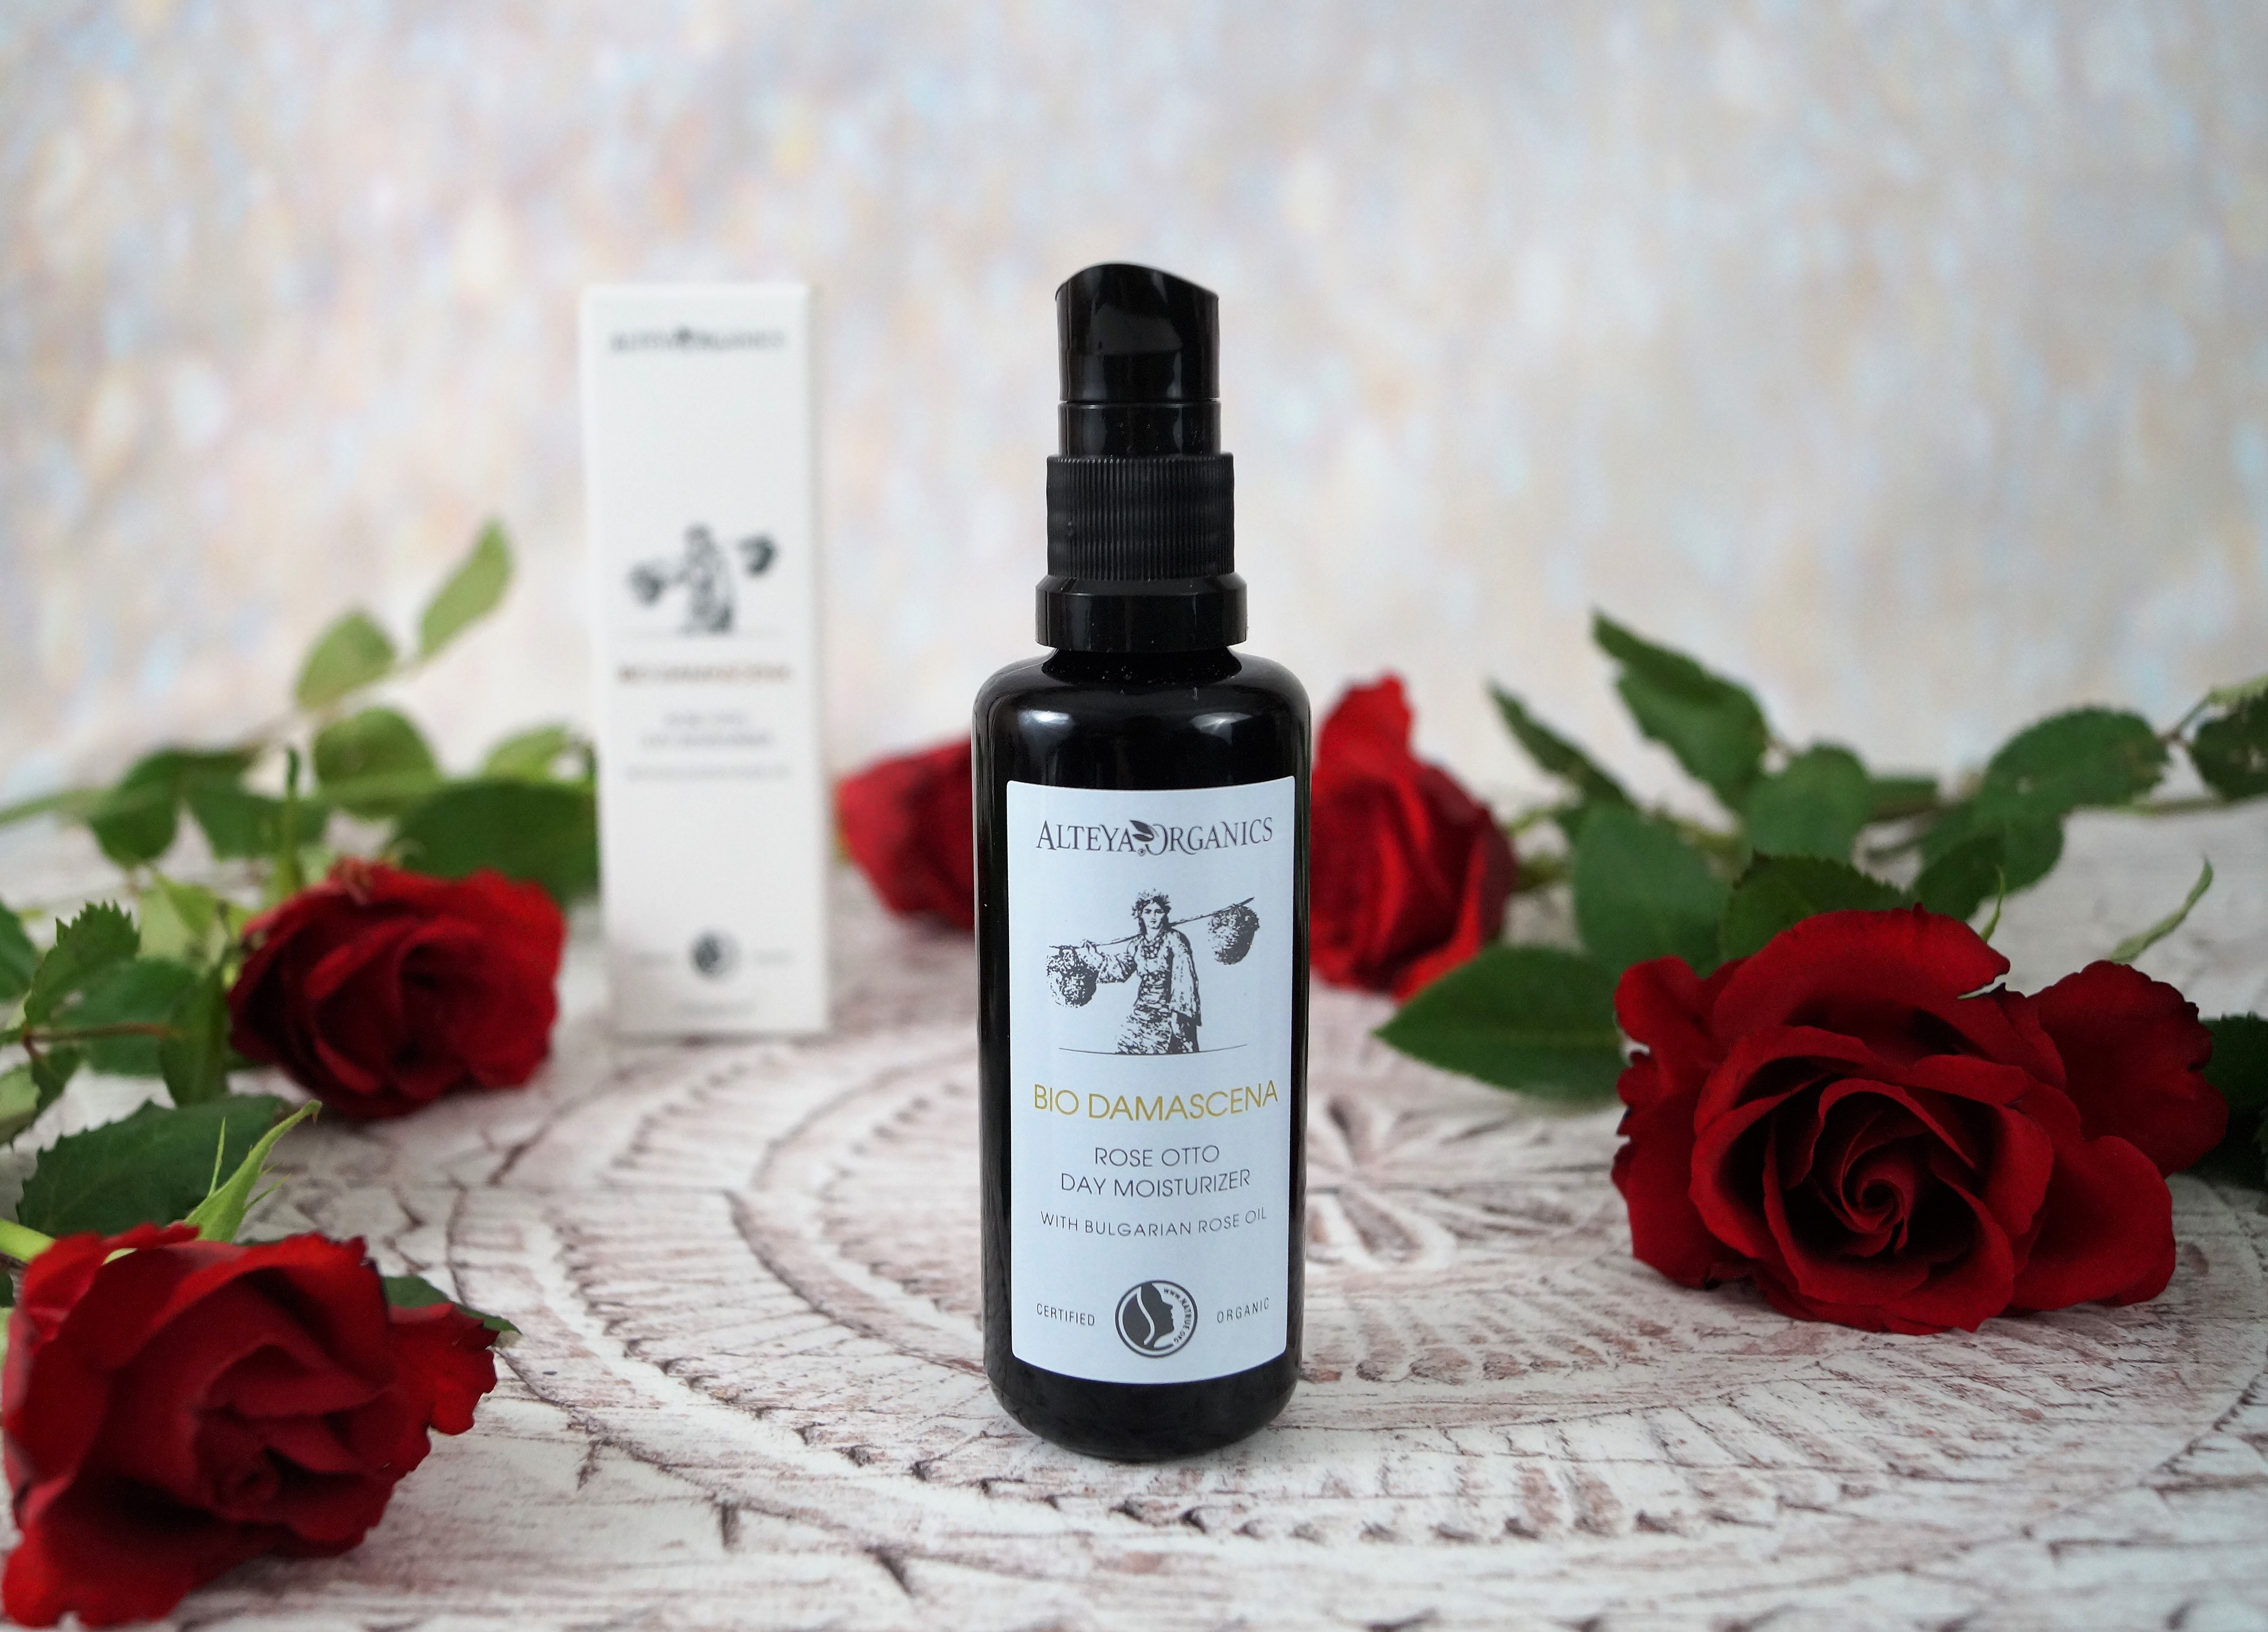 Alteya Certified Organic Rose Otto Day Face Moisturizer